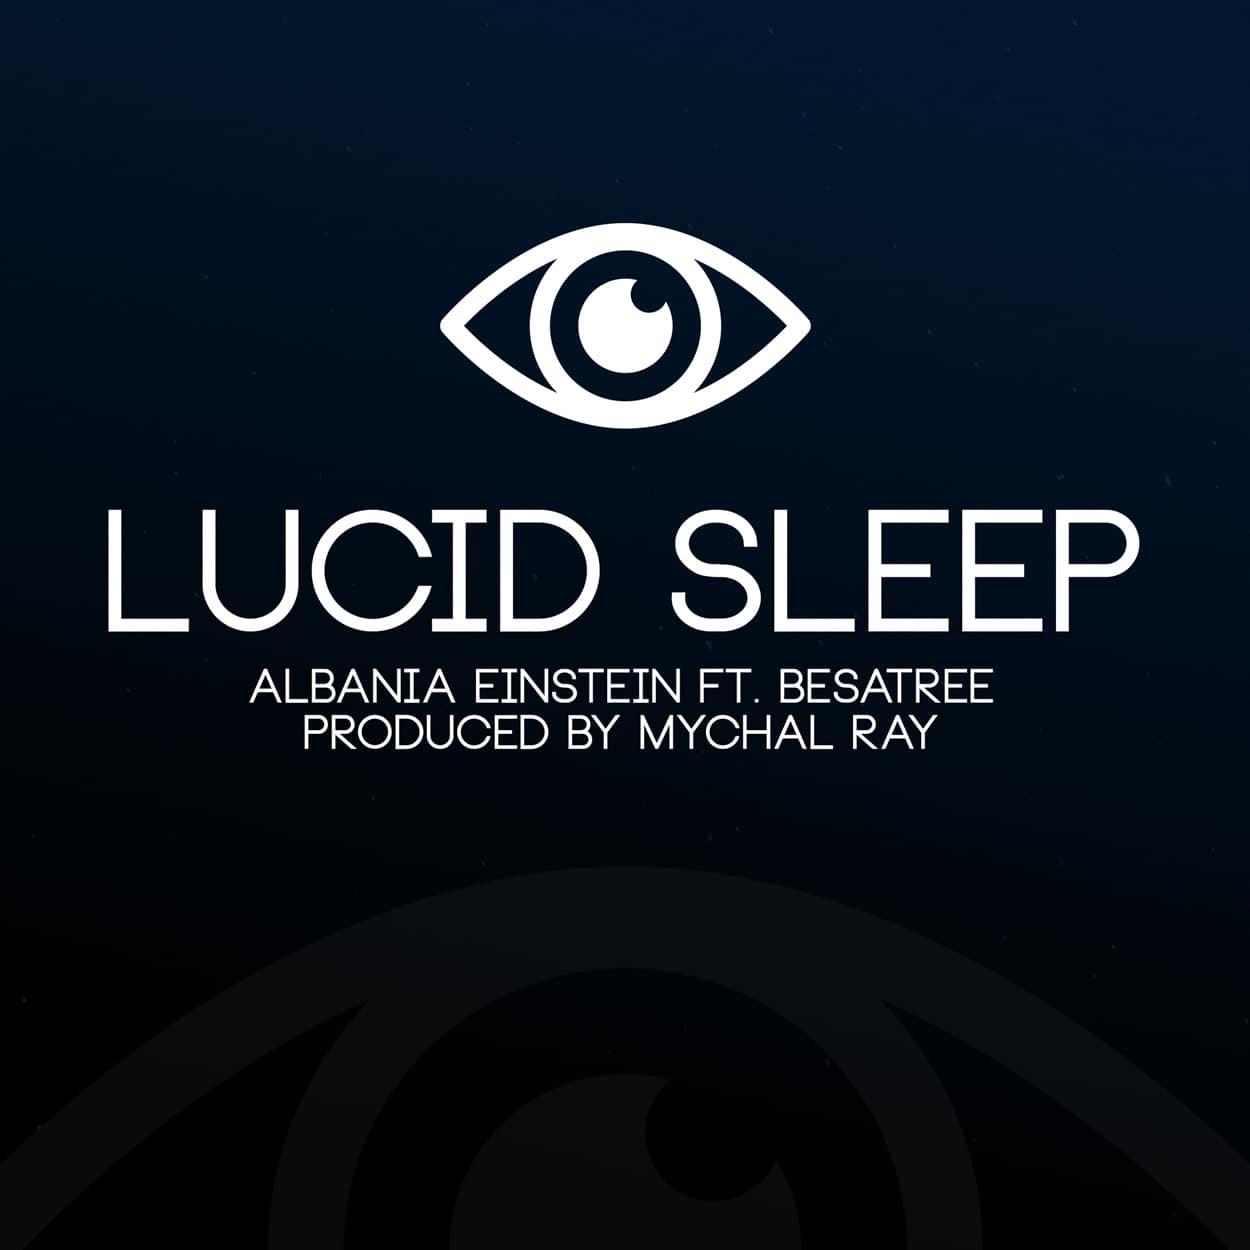 albania einstein - lucid sleep - album art design